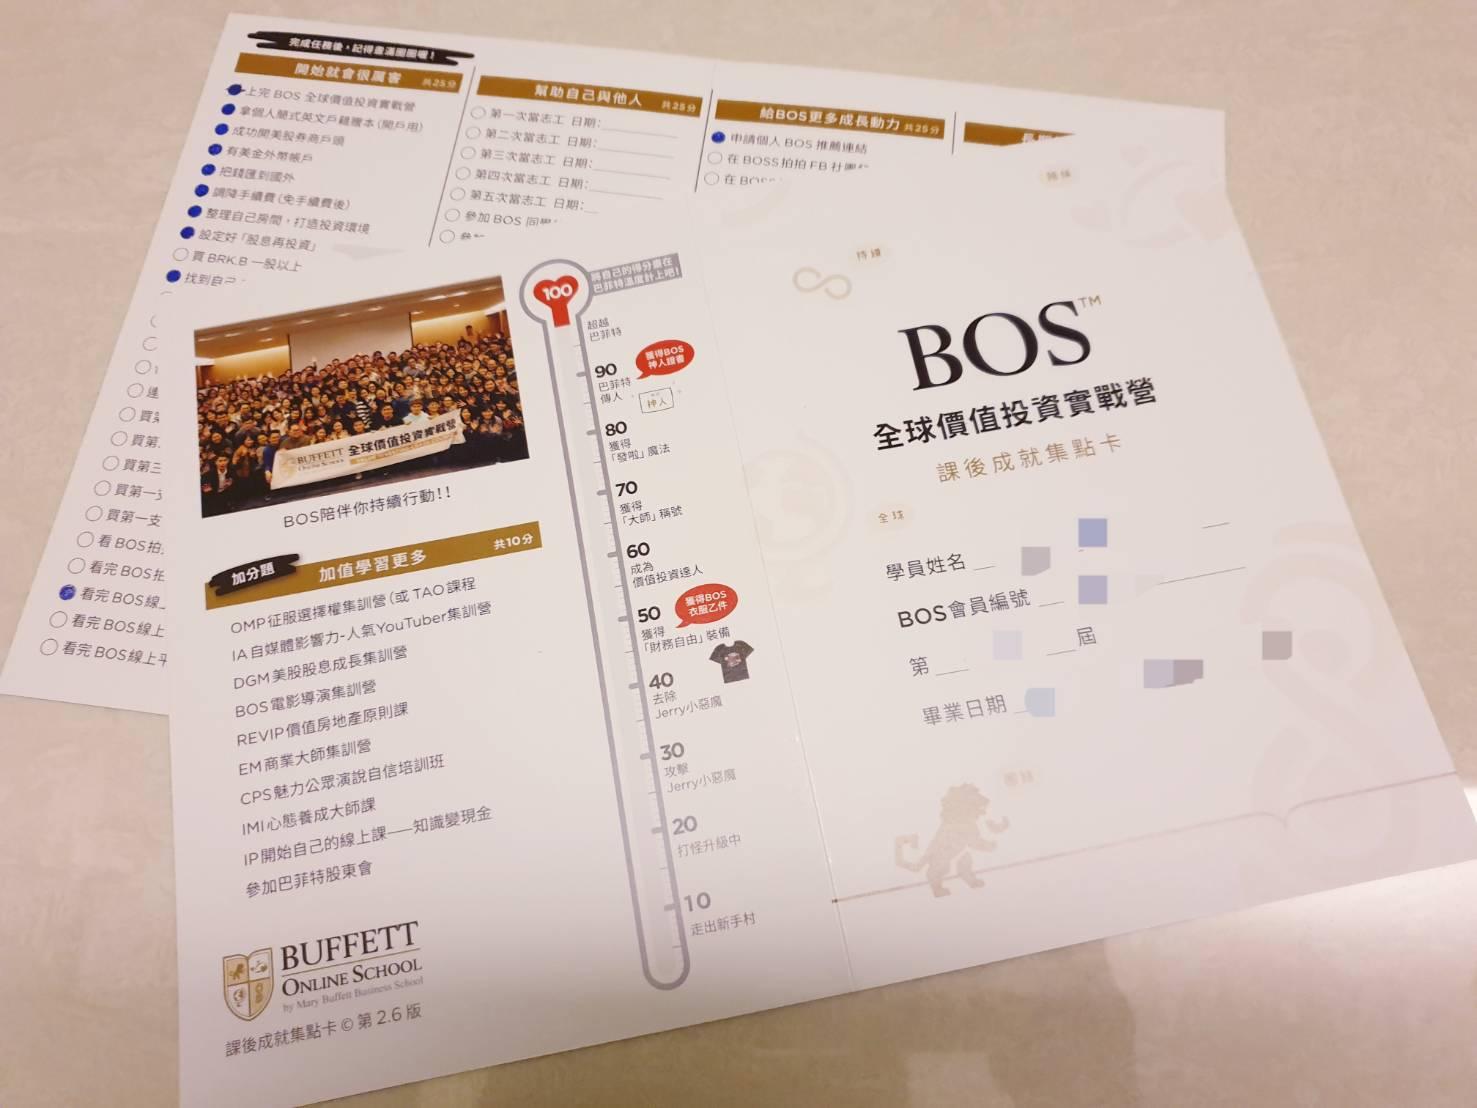 BOS巴菲特線上學院評價、學費:每個人都會得到的集點卡